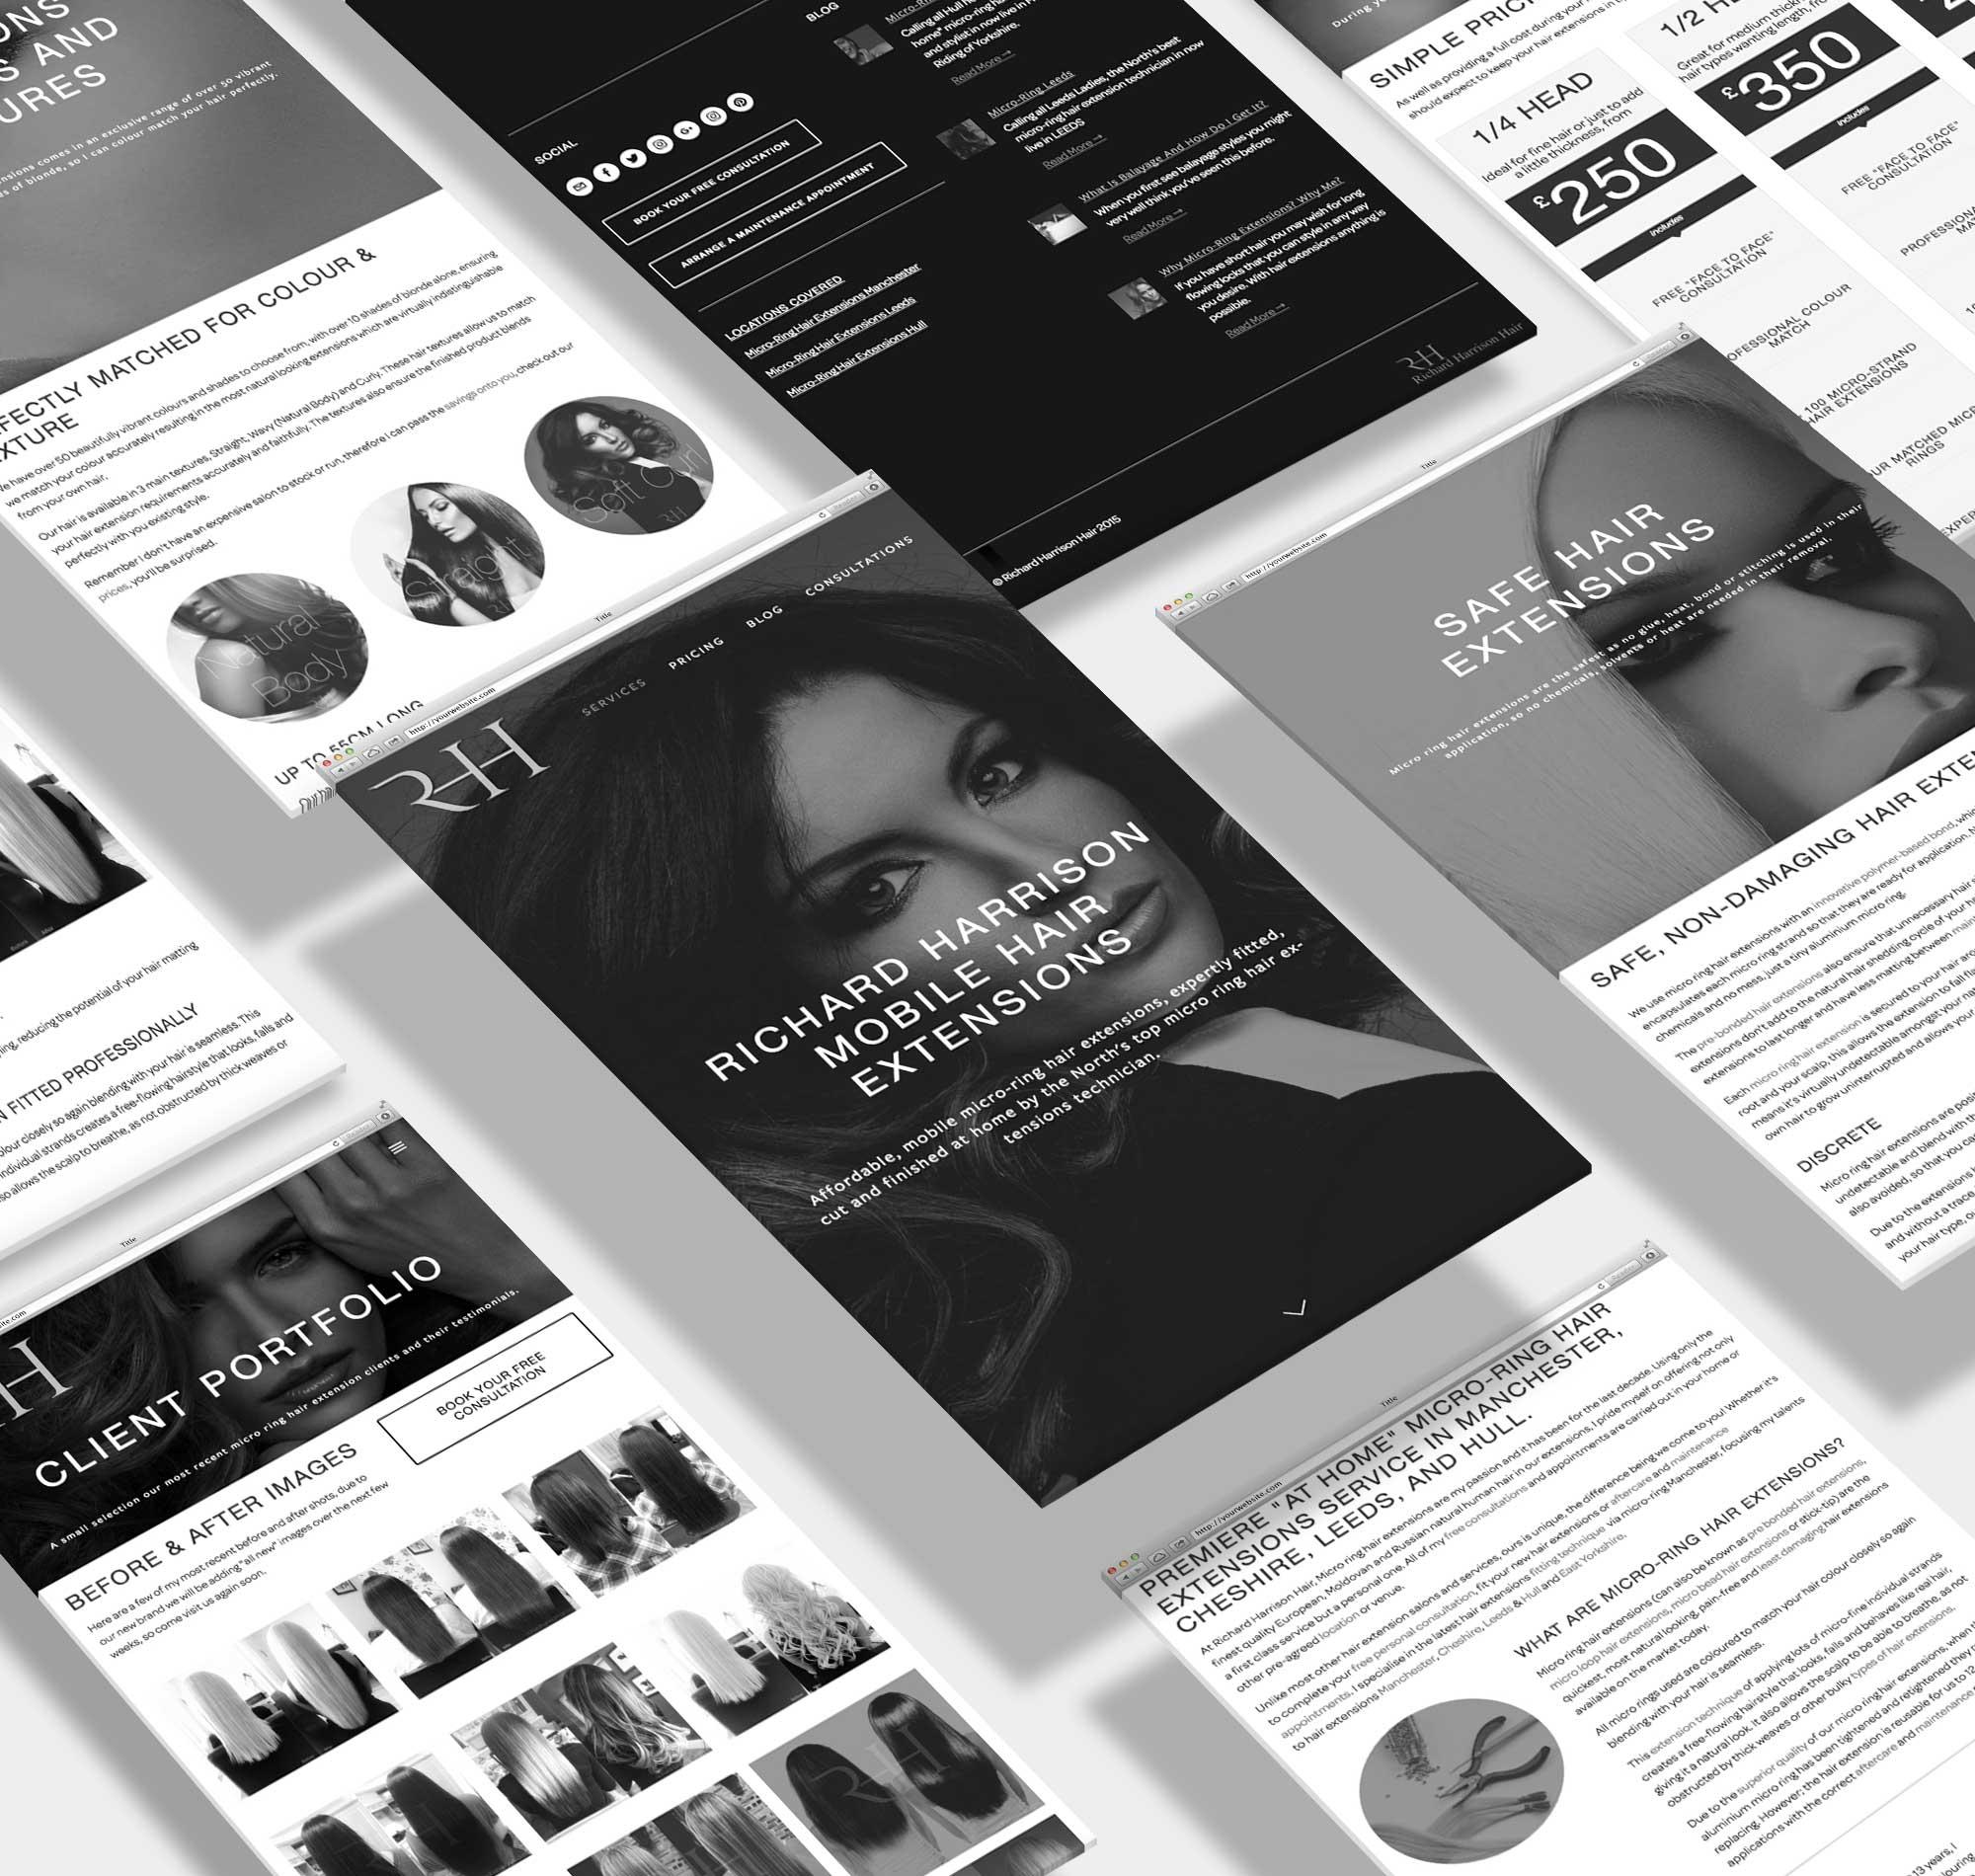 Lithium design developed a new logo and startup website for Richard Harrison Hair  richardharrisonhair.com